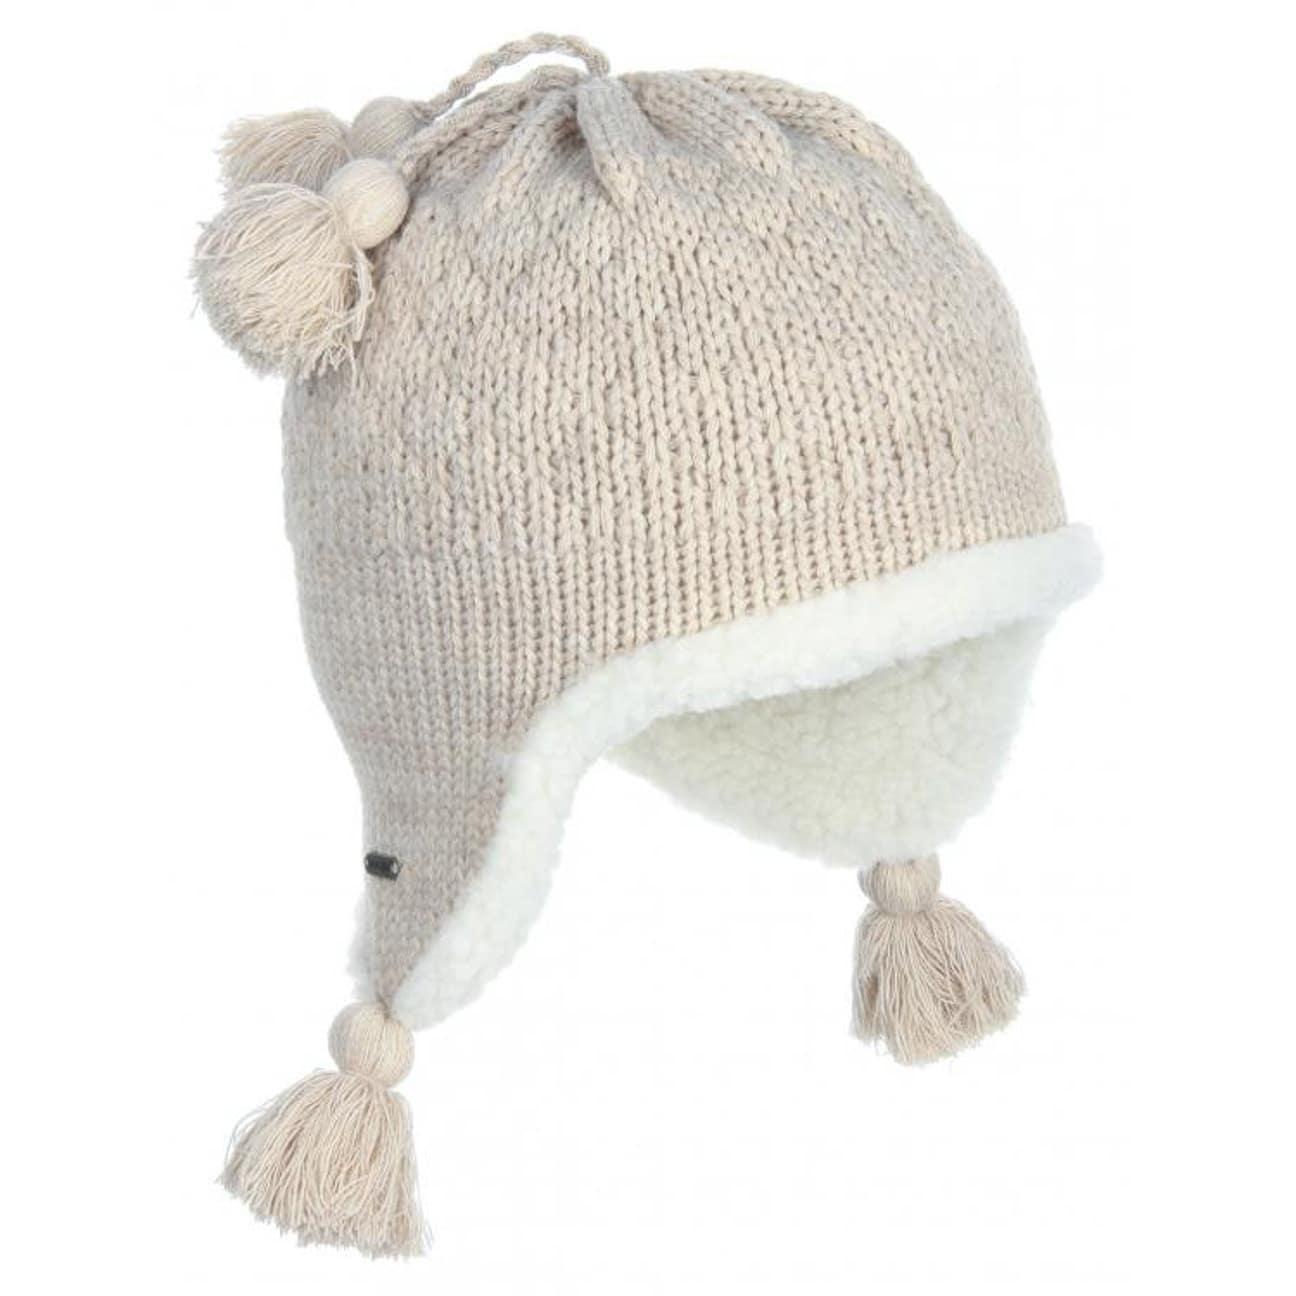 Gorro Peruano Cairina by McBURN - Gorros - sombreroshop.es 5a5a0287b04